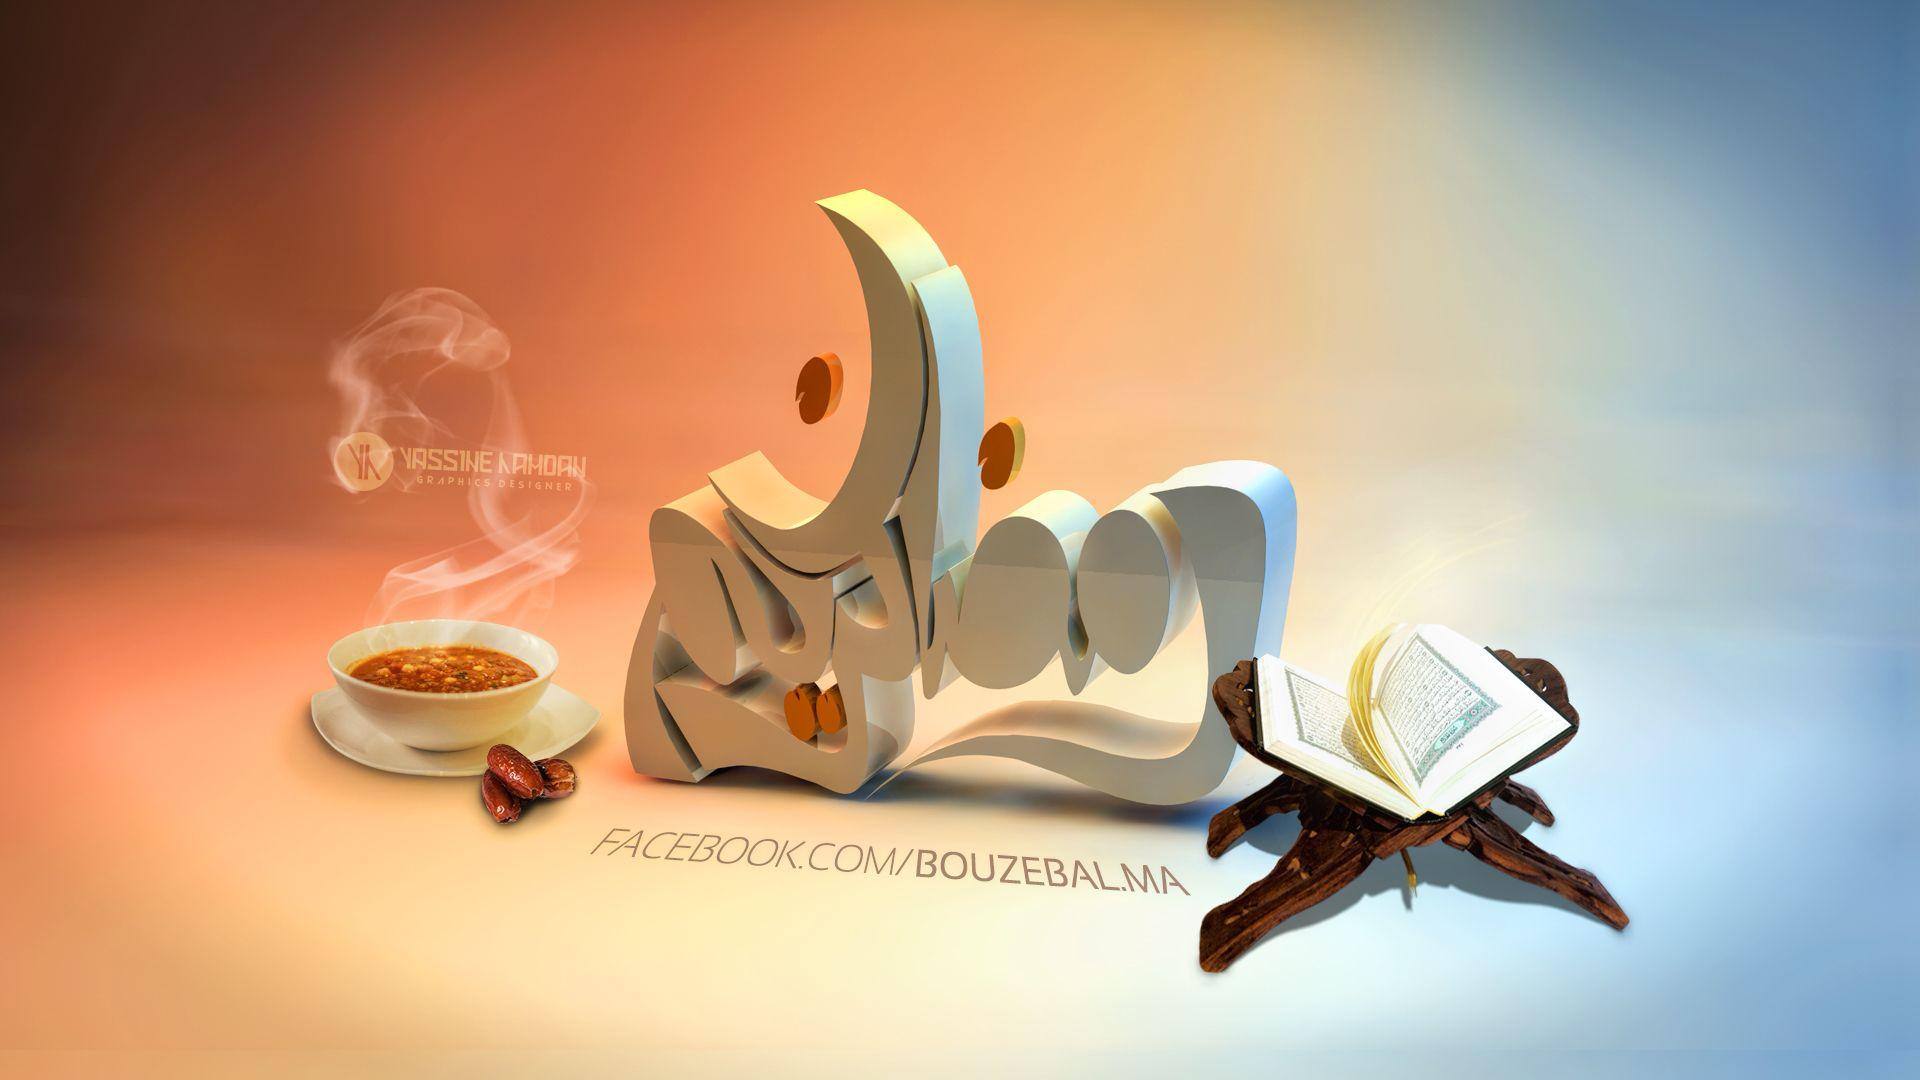 Ramadan Wallpaper Hd Free Download Ramadan Wallpaper Hd Ramadan Greetings Eid Mubarak Background